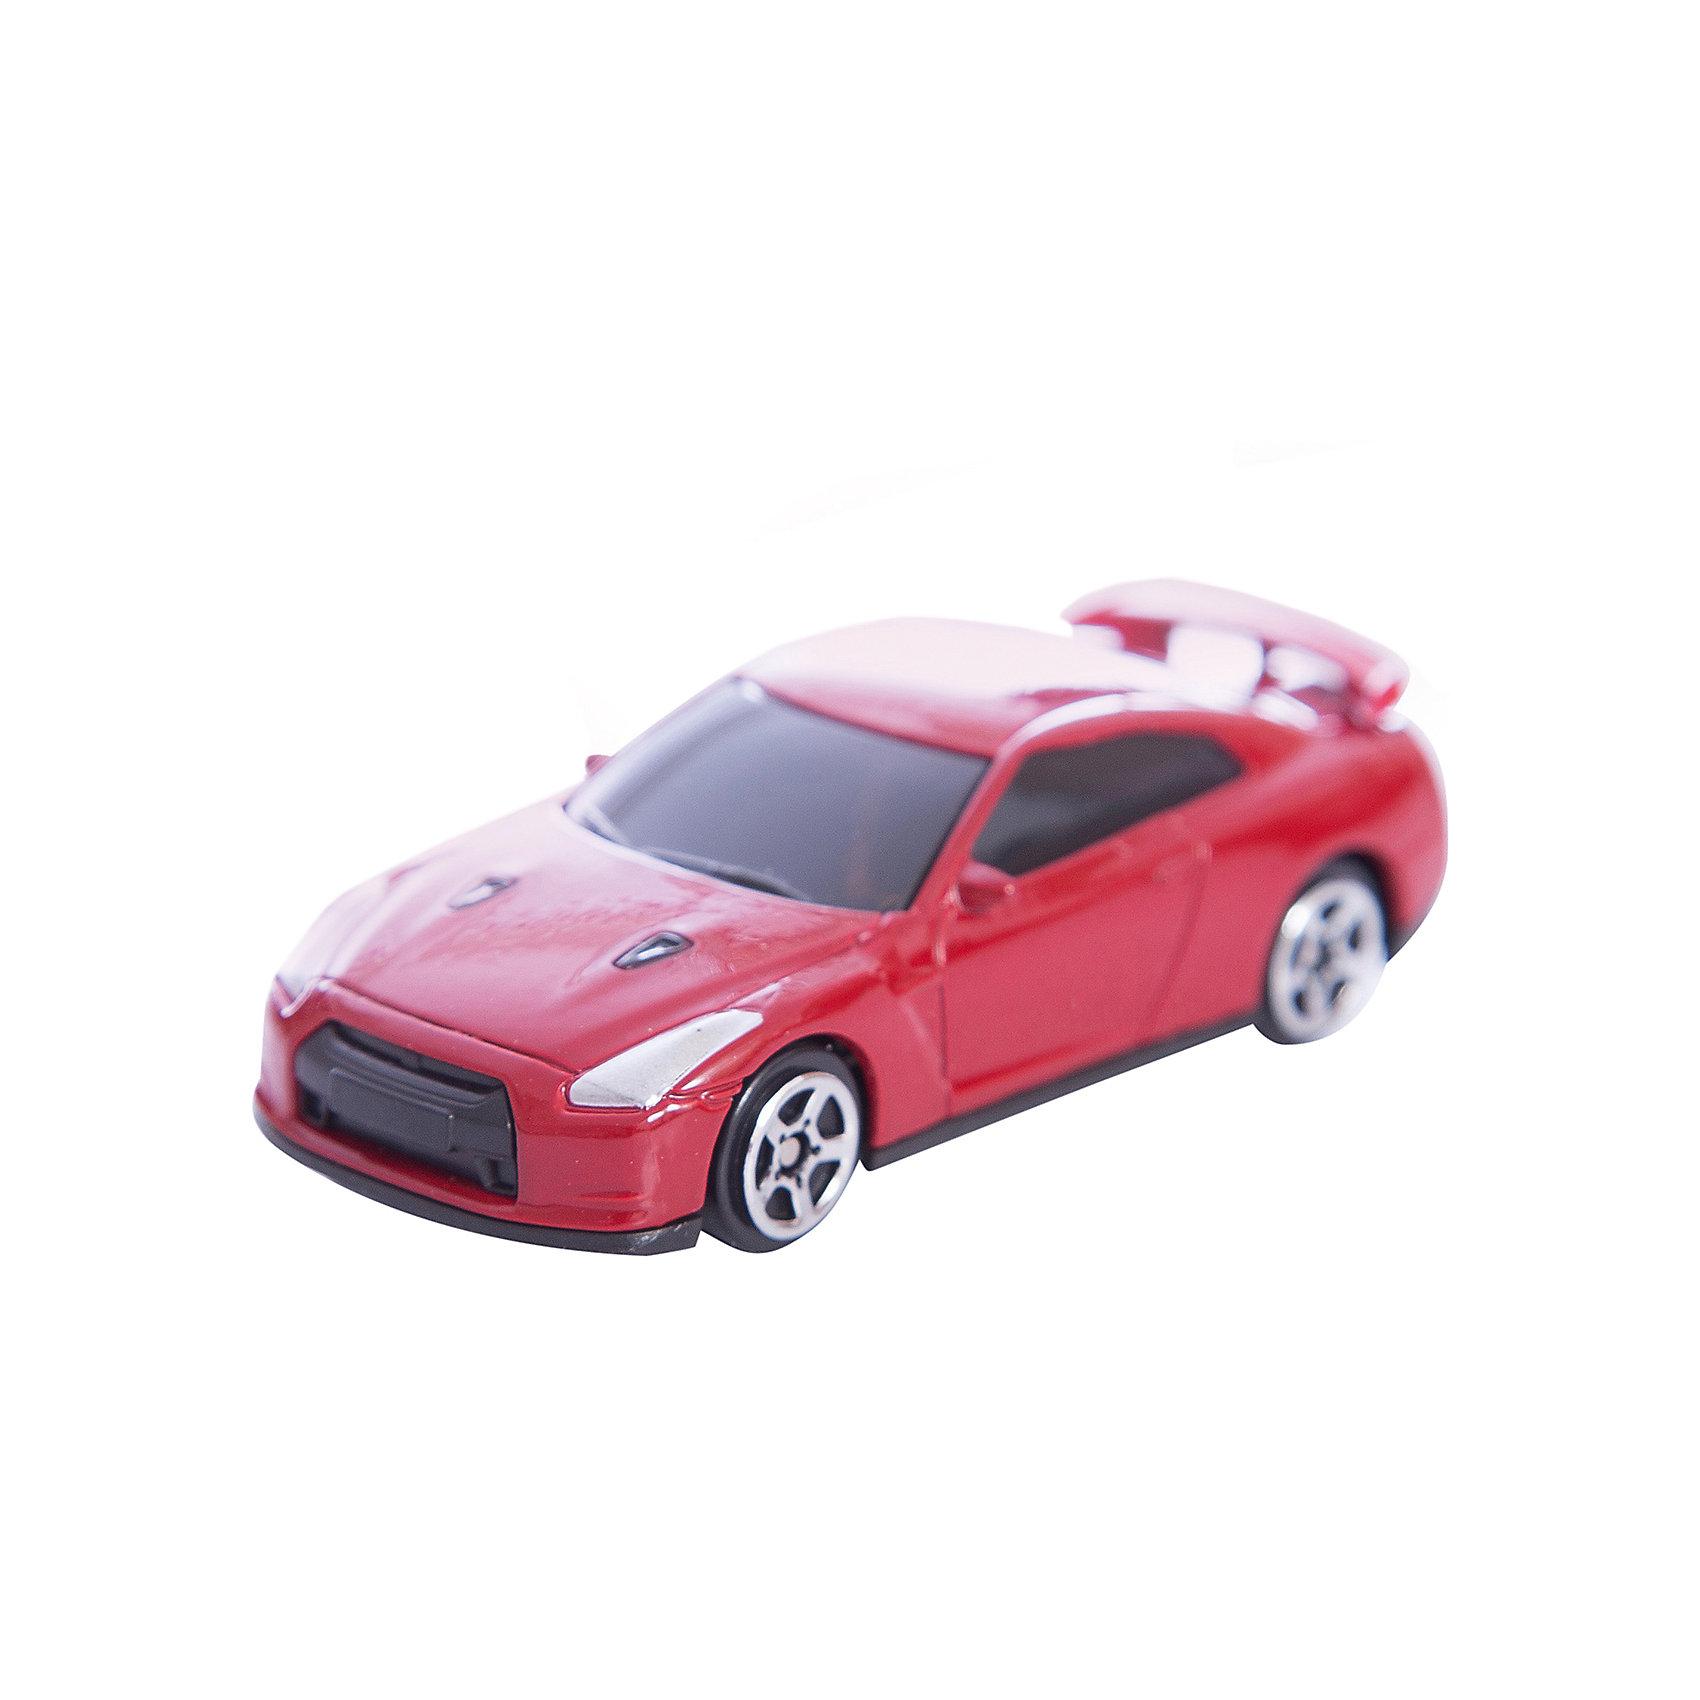 Машинка Nissan GT-R (R35) Jeans 1:64, AutotimeМашинки<br><br><br>Ширина мм: 90<br>Глубина мм: 42<br>Высота мм: 40<br>Вес г: 14<br>Возраст от месяцев: 36<br>Возраст до месяцев: 2147483647<br>Пол: Мужской<br>Возраст: Детский<br>SKU: 5584068